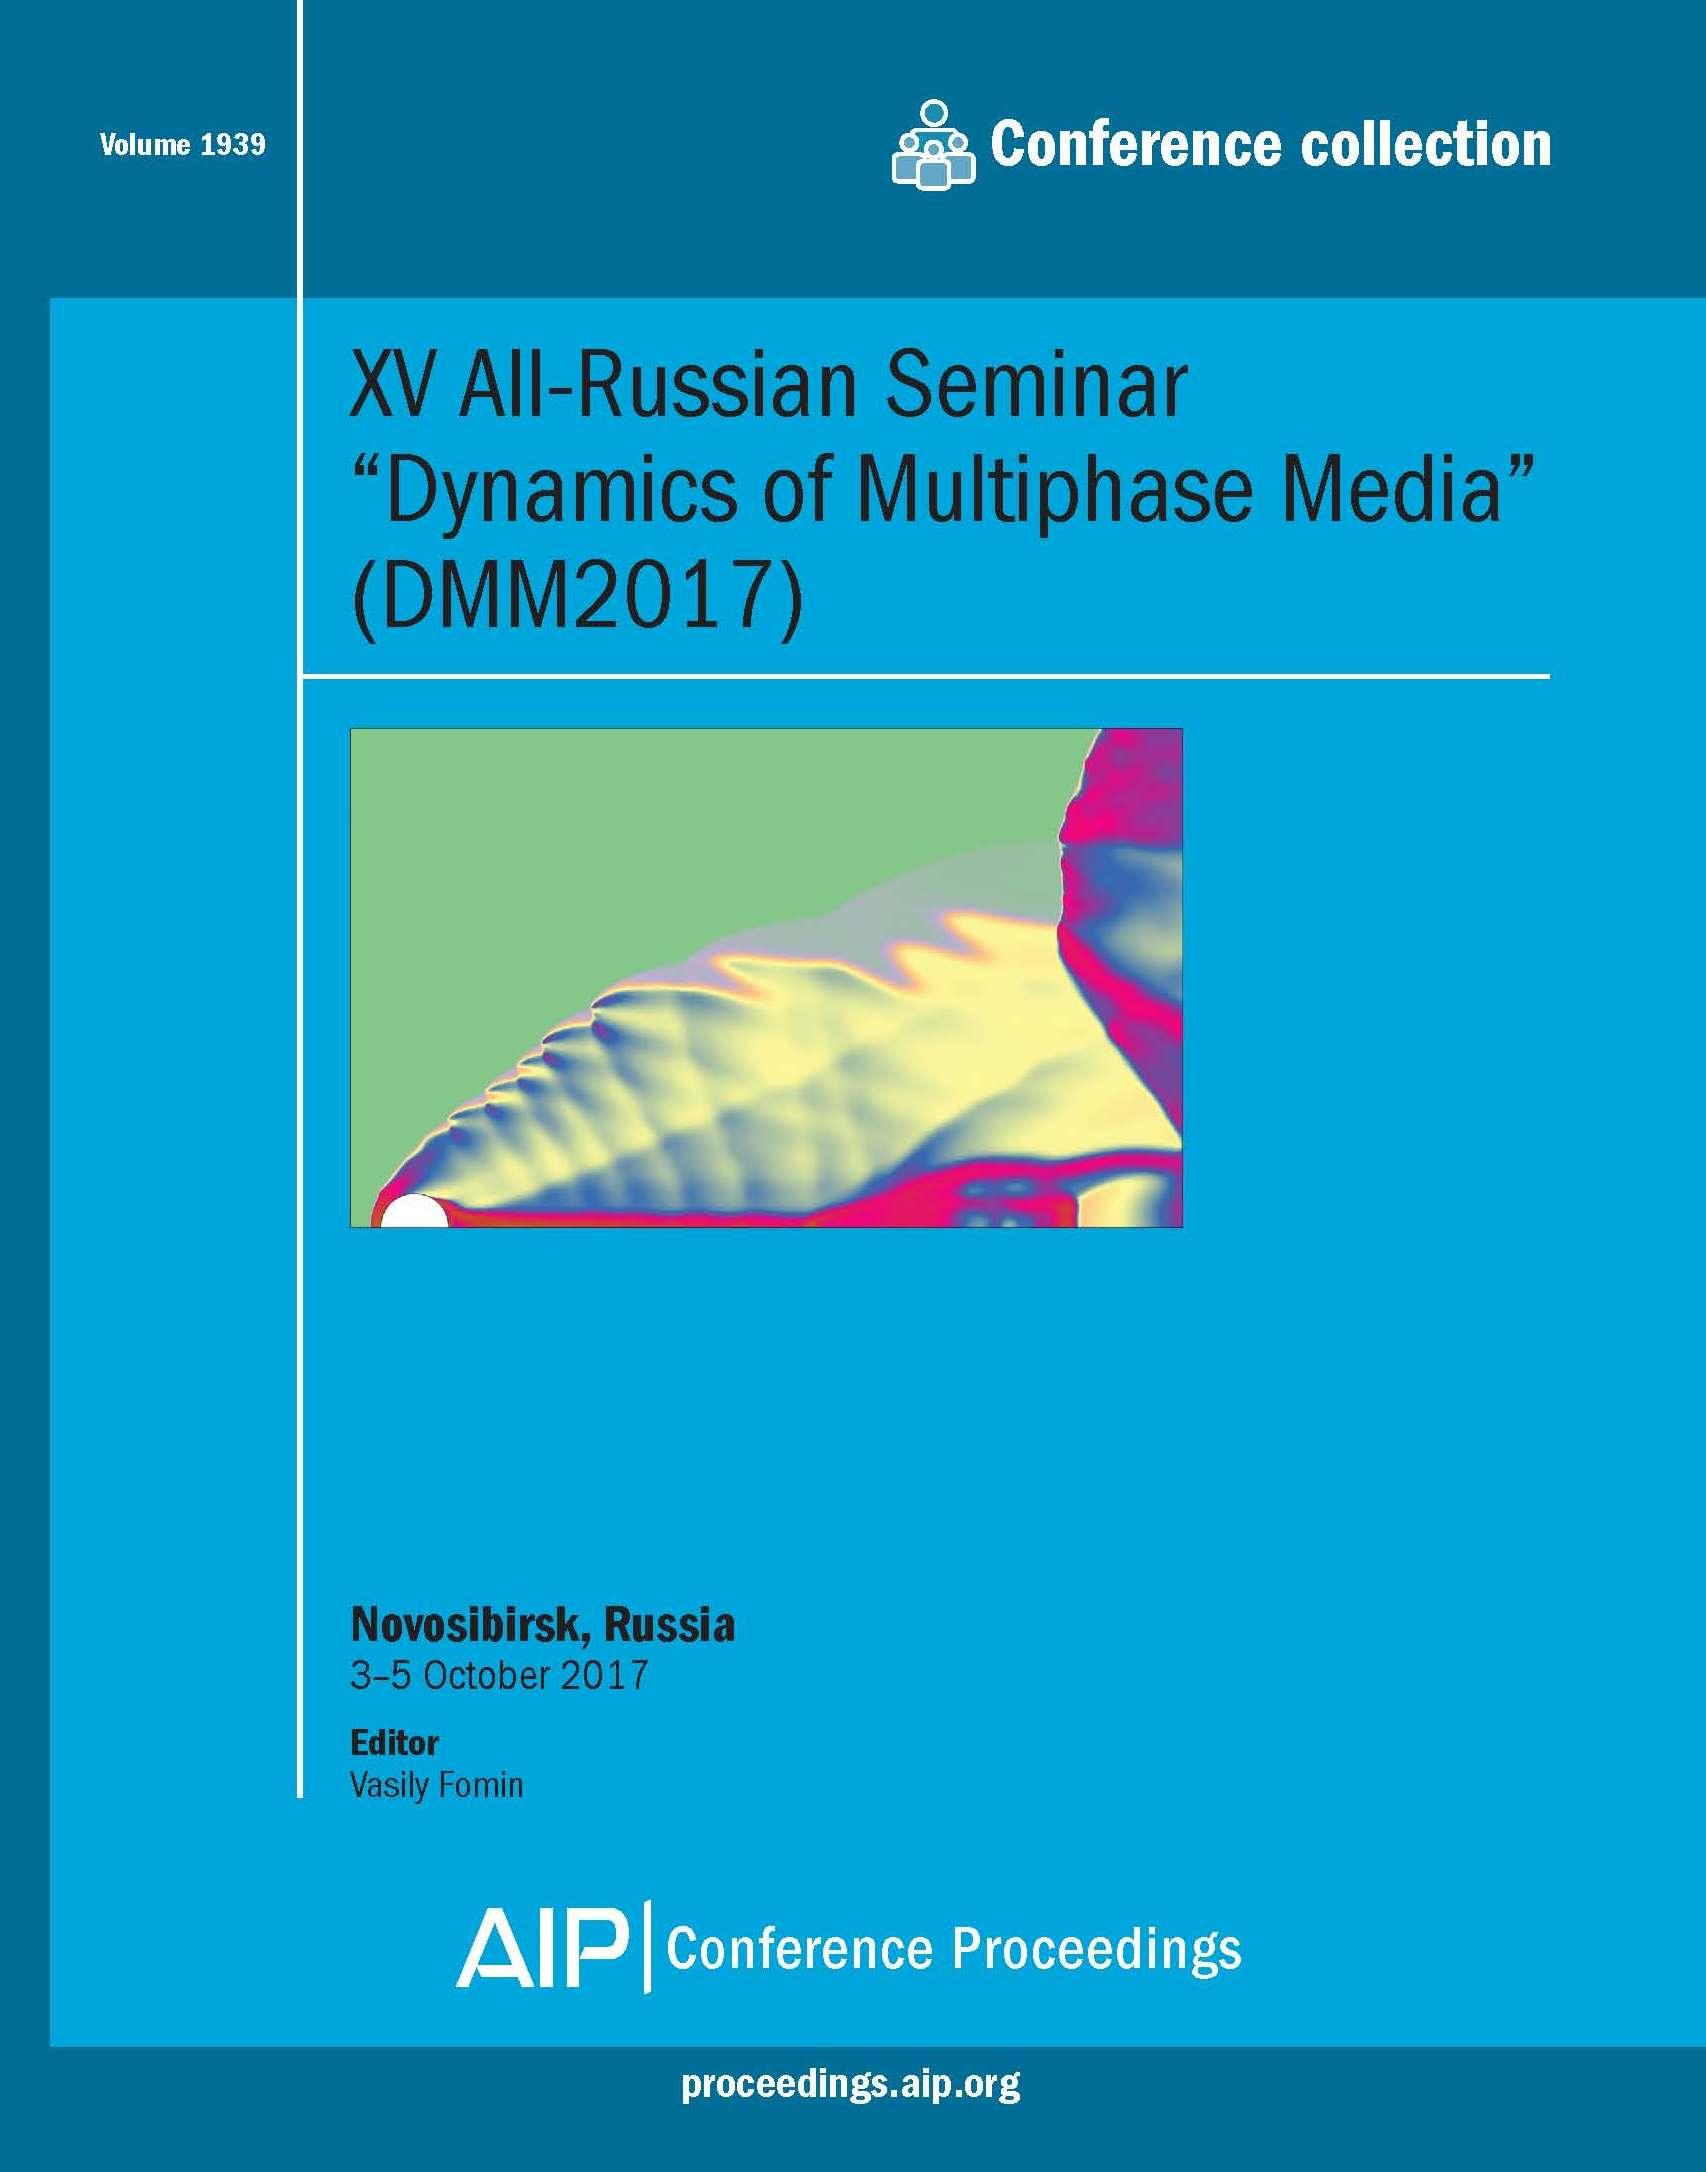 Volume 1939: XV All-Russian Seminar